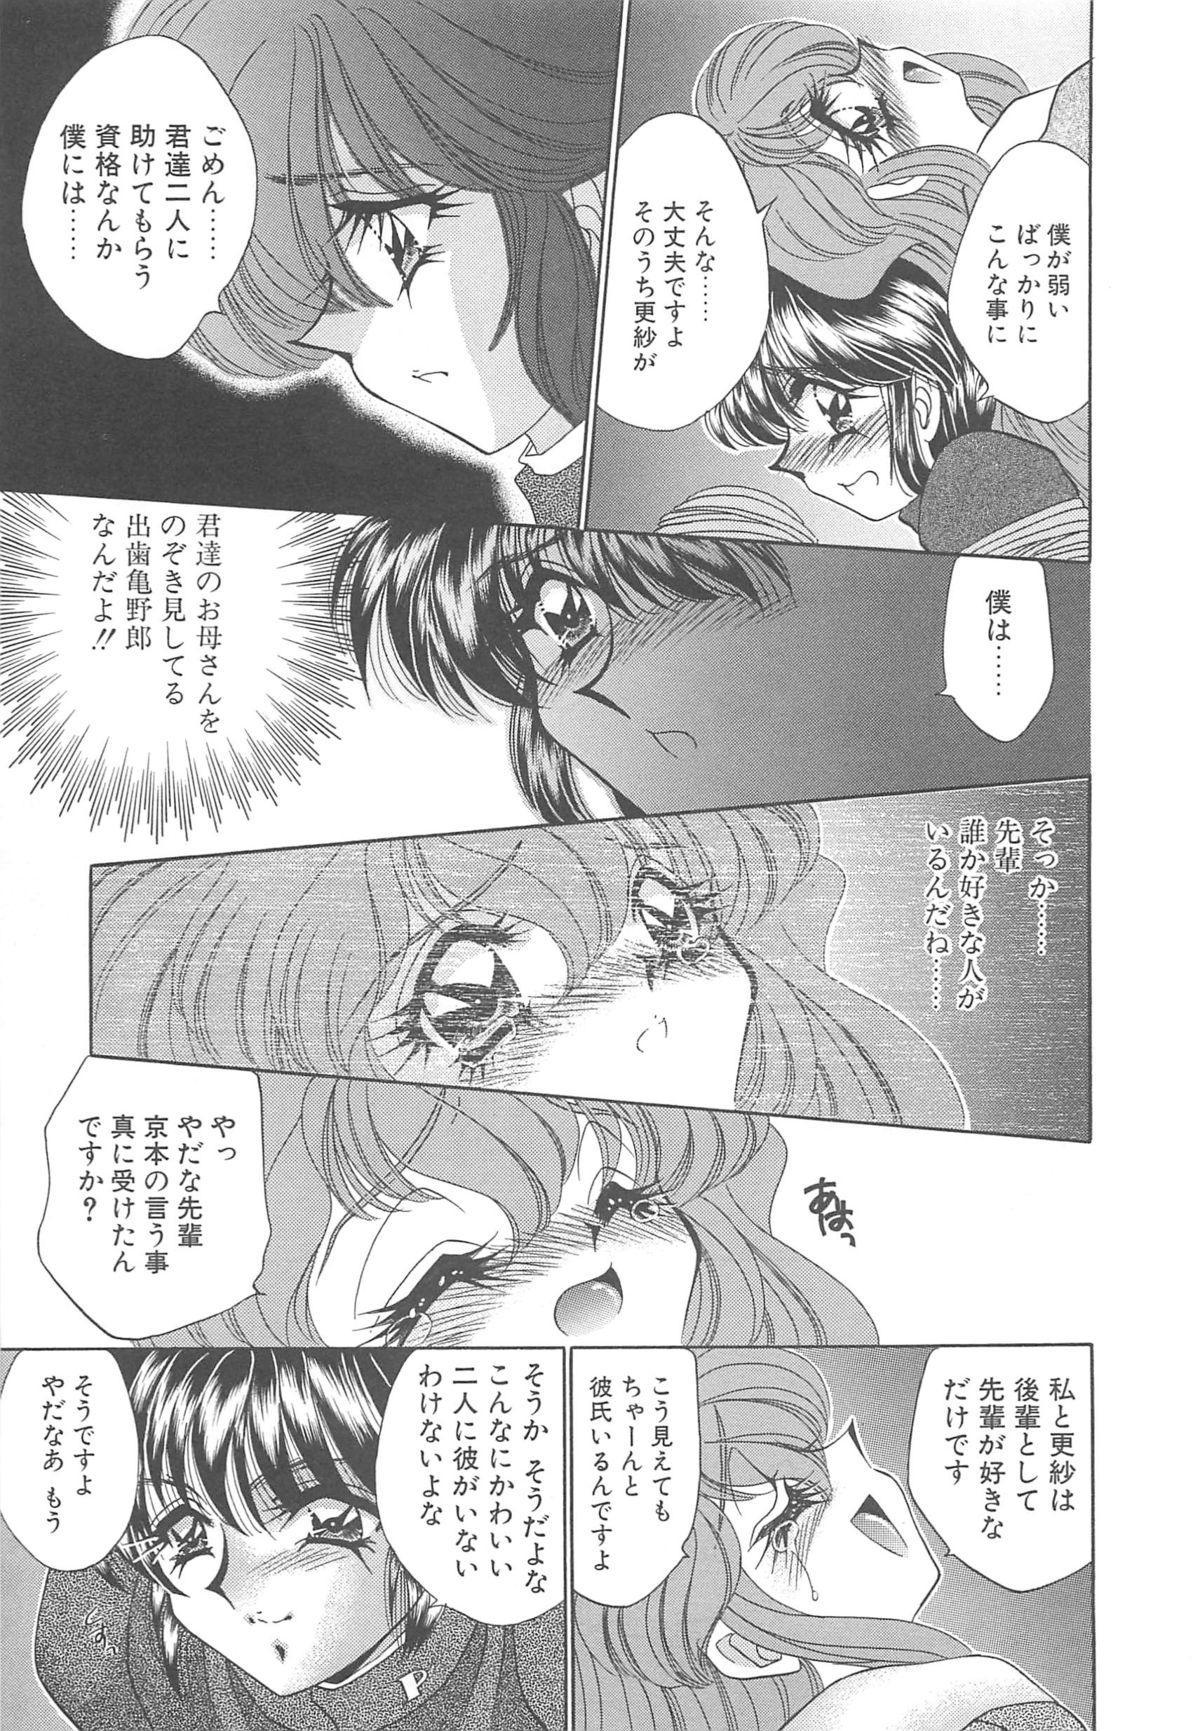 Kigurumi Sentai Quiltian 193